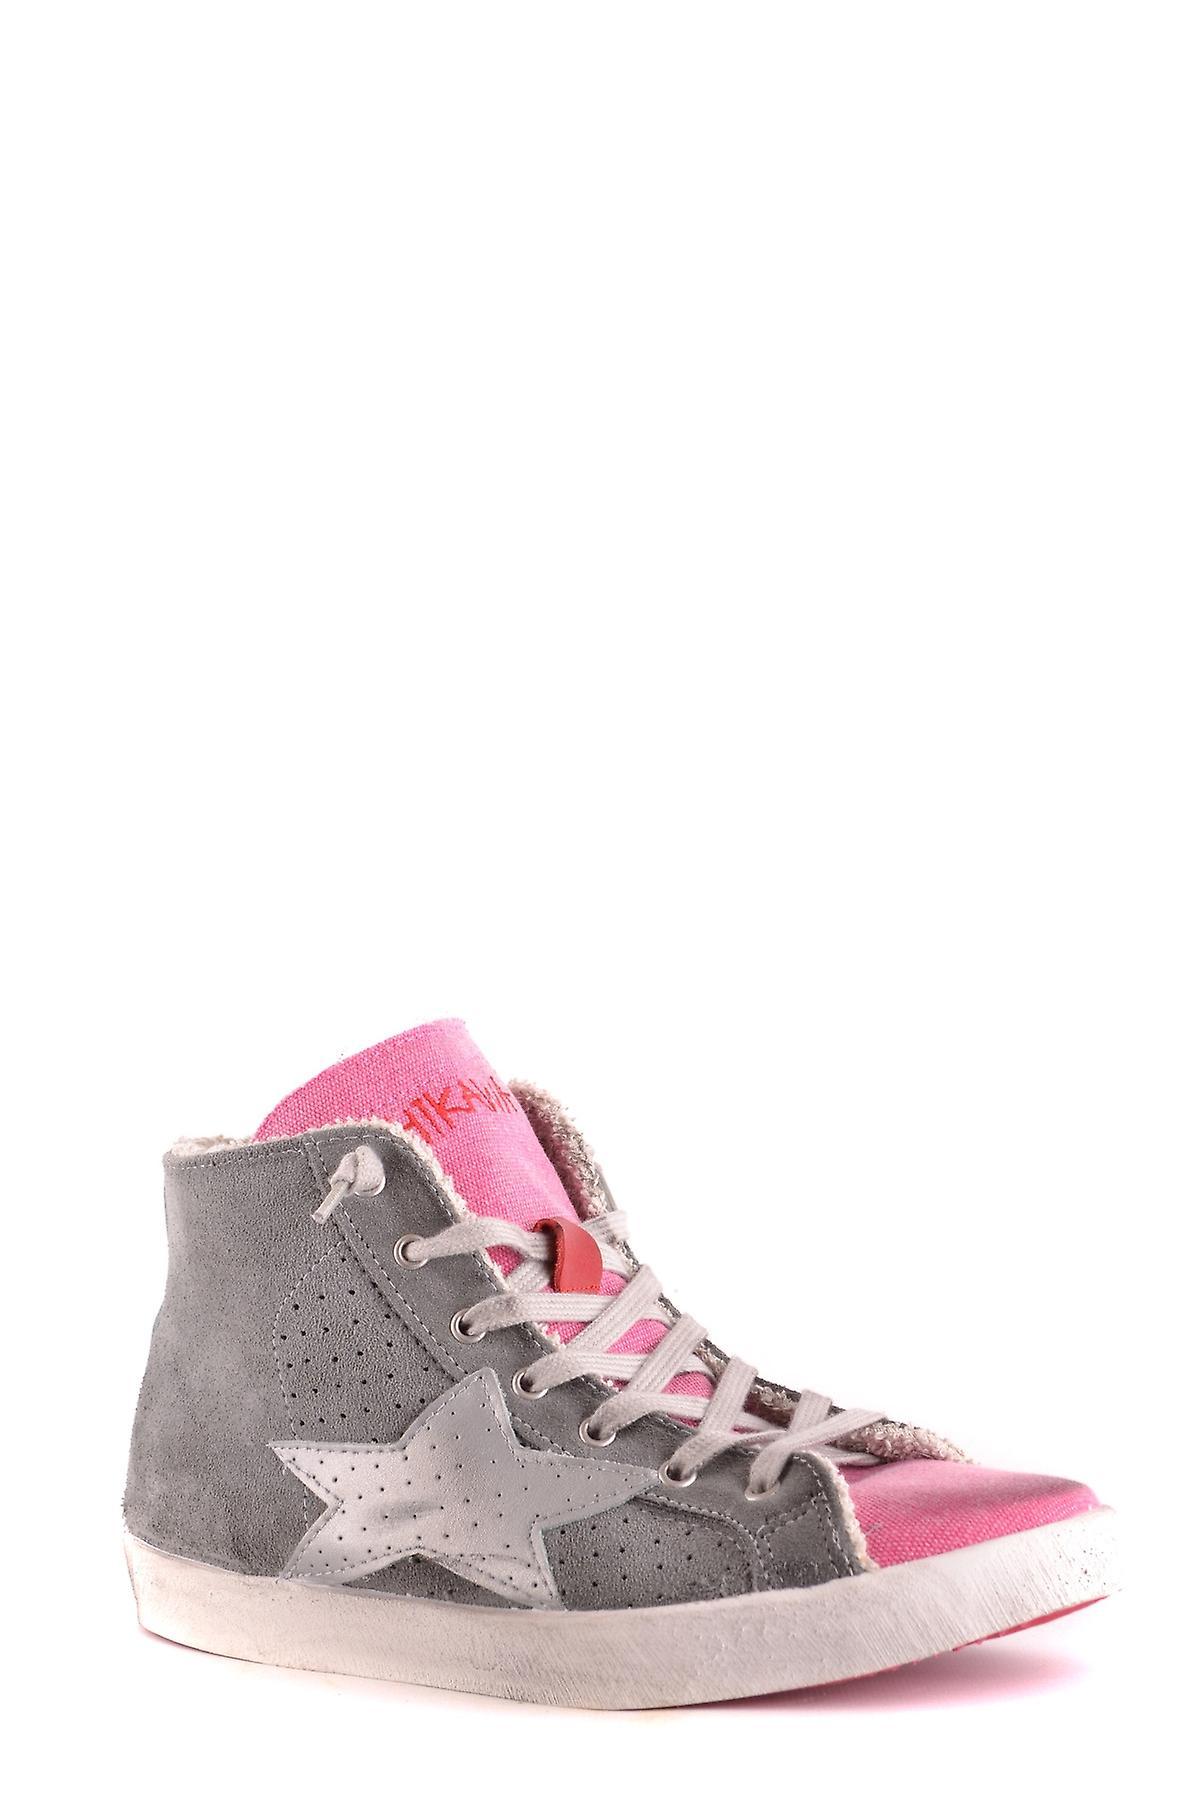 Ishikawa Ezbc088012 Donne's Grey Suede Hi Top Sneakers